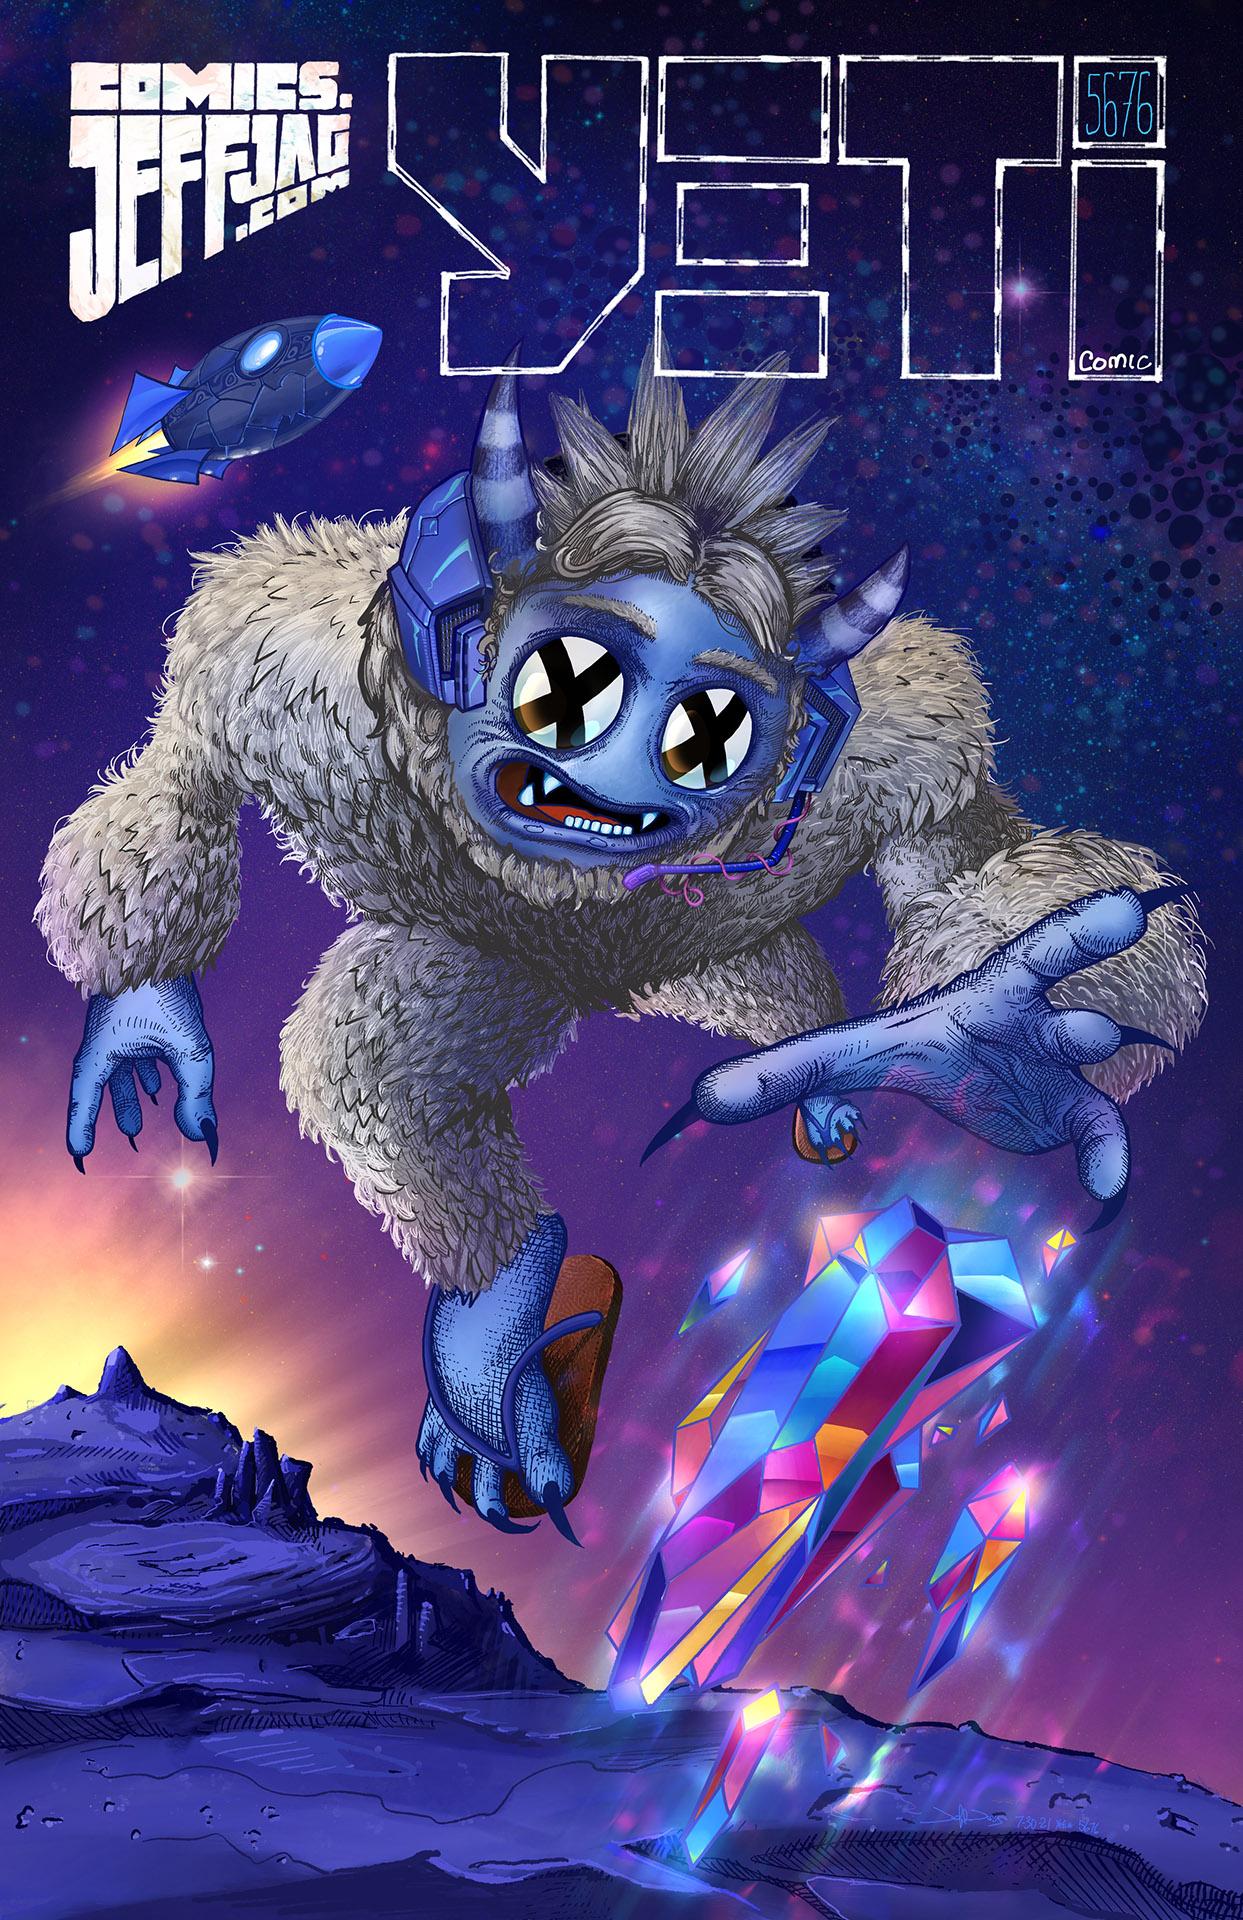 Yeticomic.com #JeffJag of Super Yeti #5676